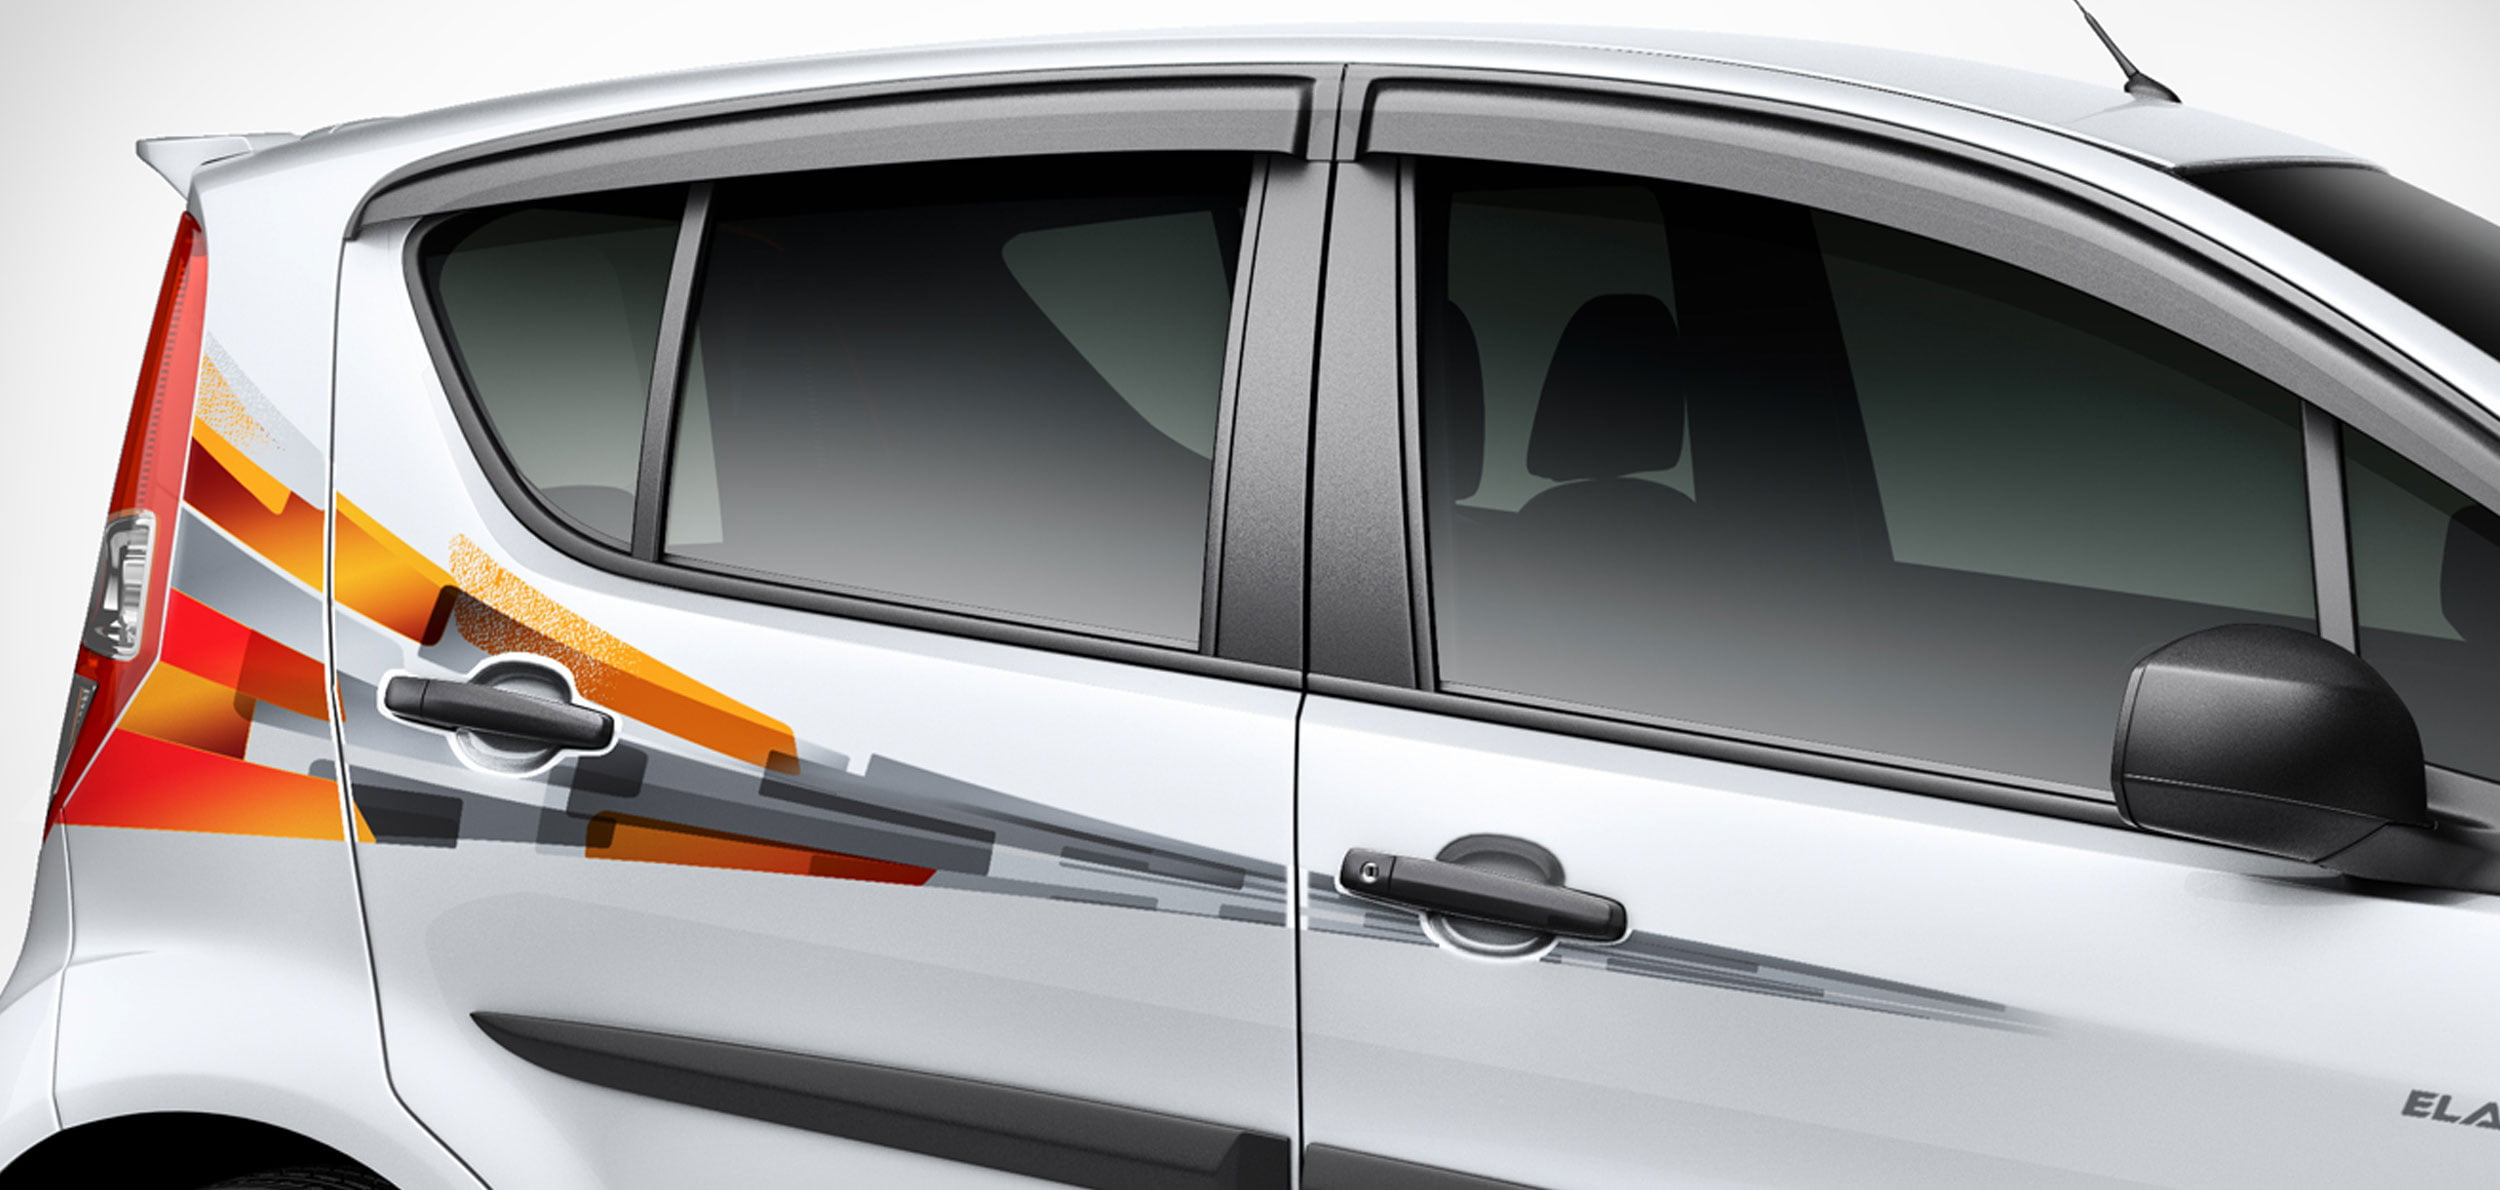 Maruti Suzuki Ritz Elate Special Edition Launched In India - Car body graphics for alto